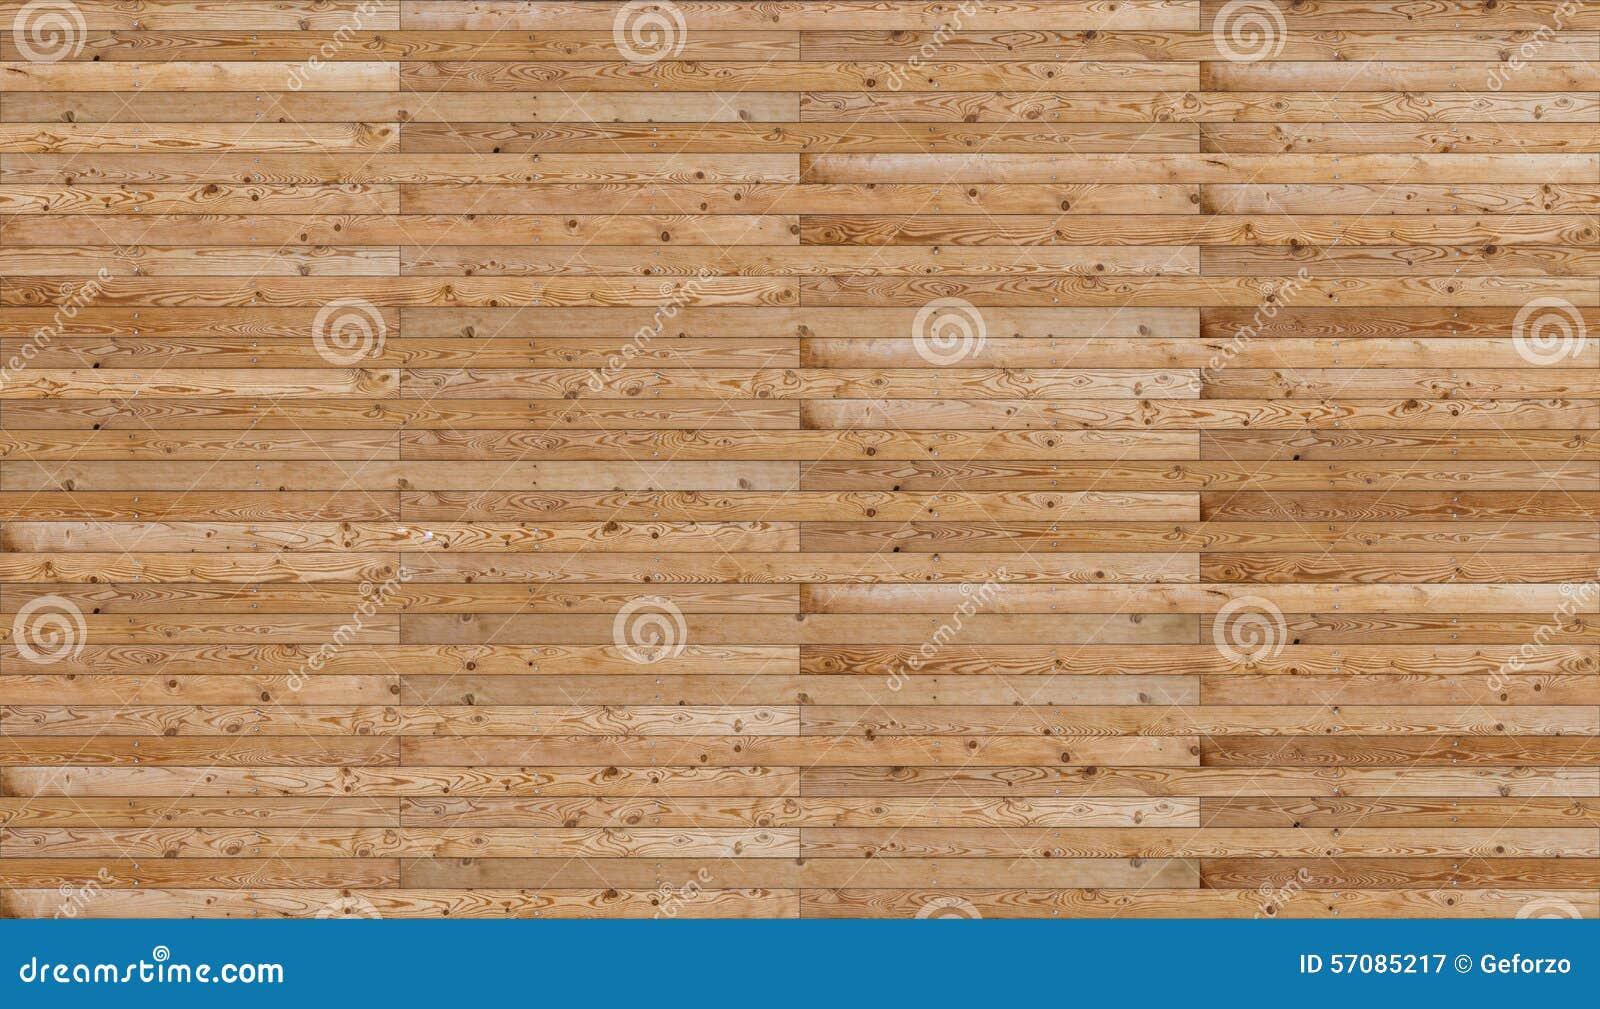 Wood house siding texture. Wood House Siding Texture Stock Illustration   Image  57085217